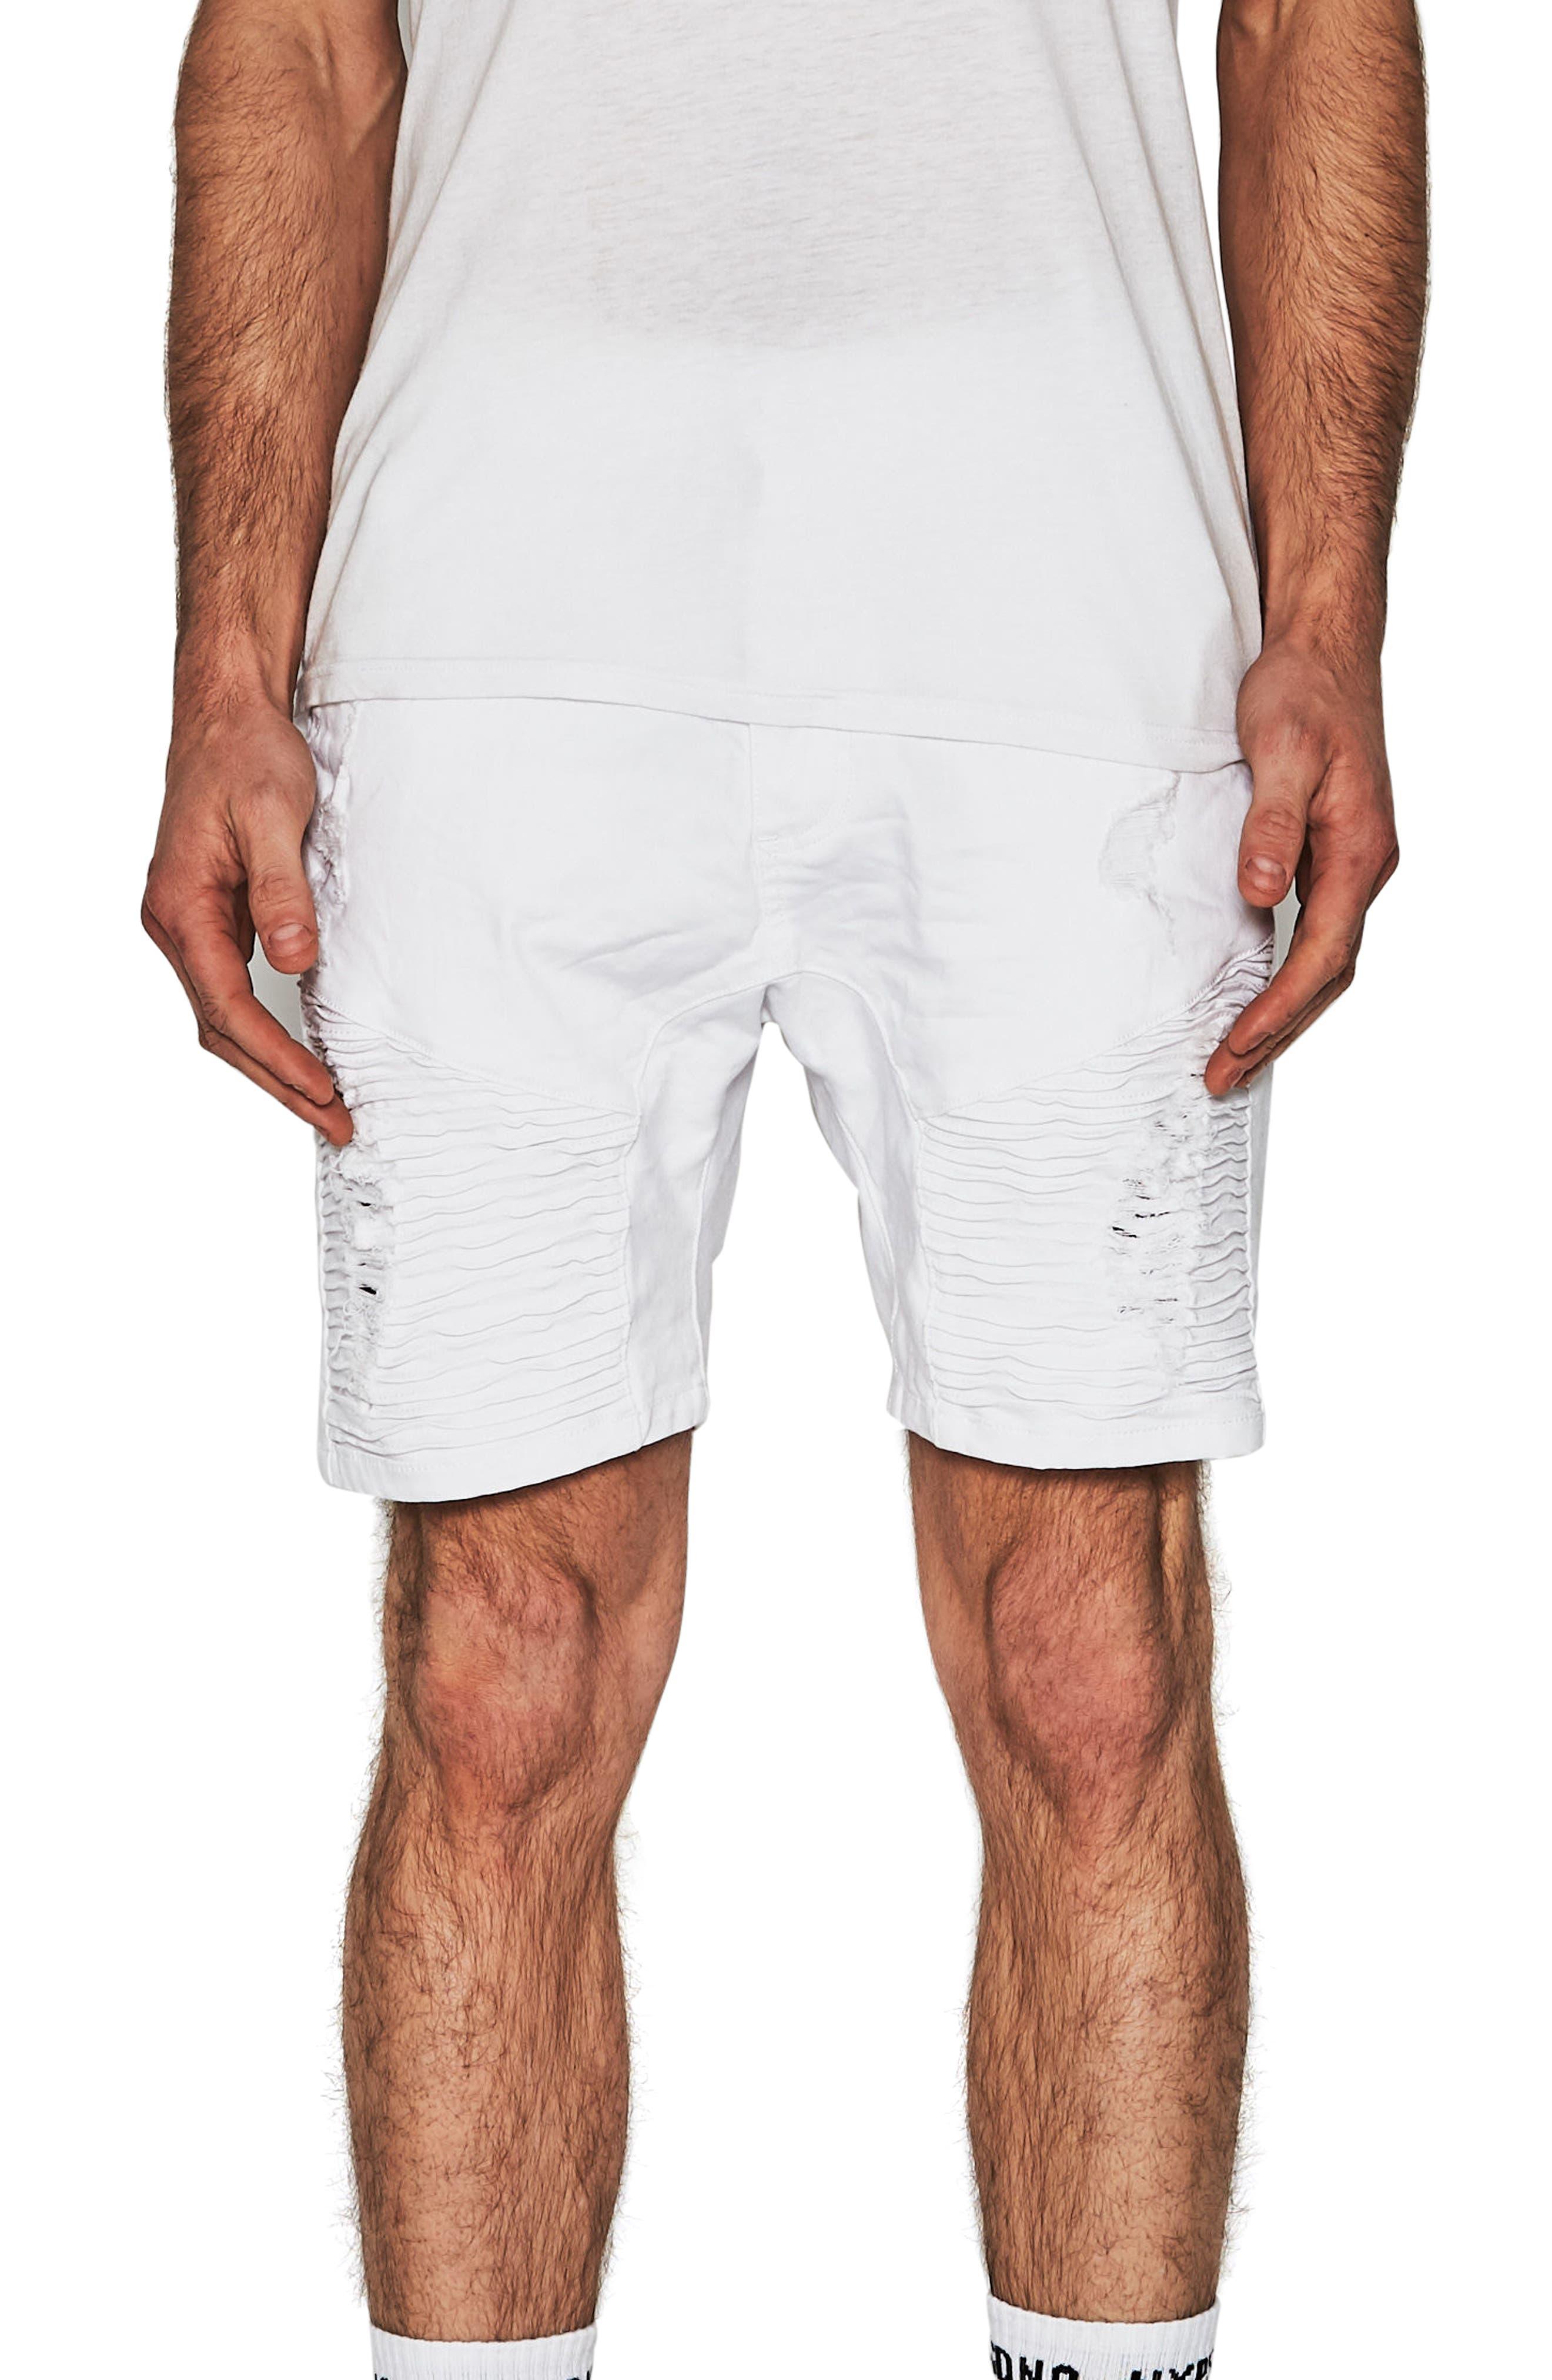 Destroyer Shorts,                         Main,                         color, 100